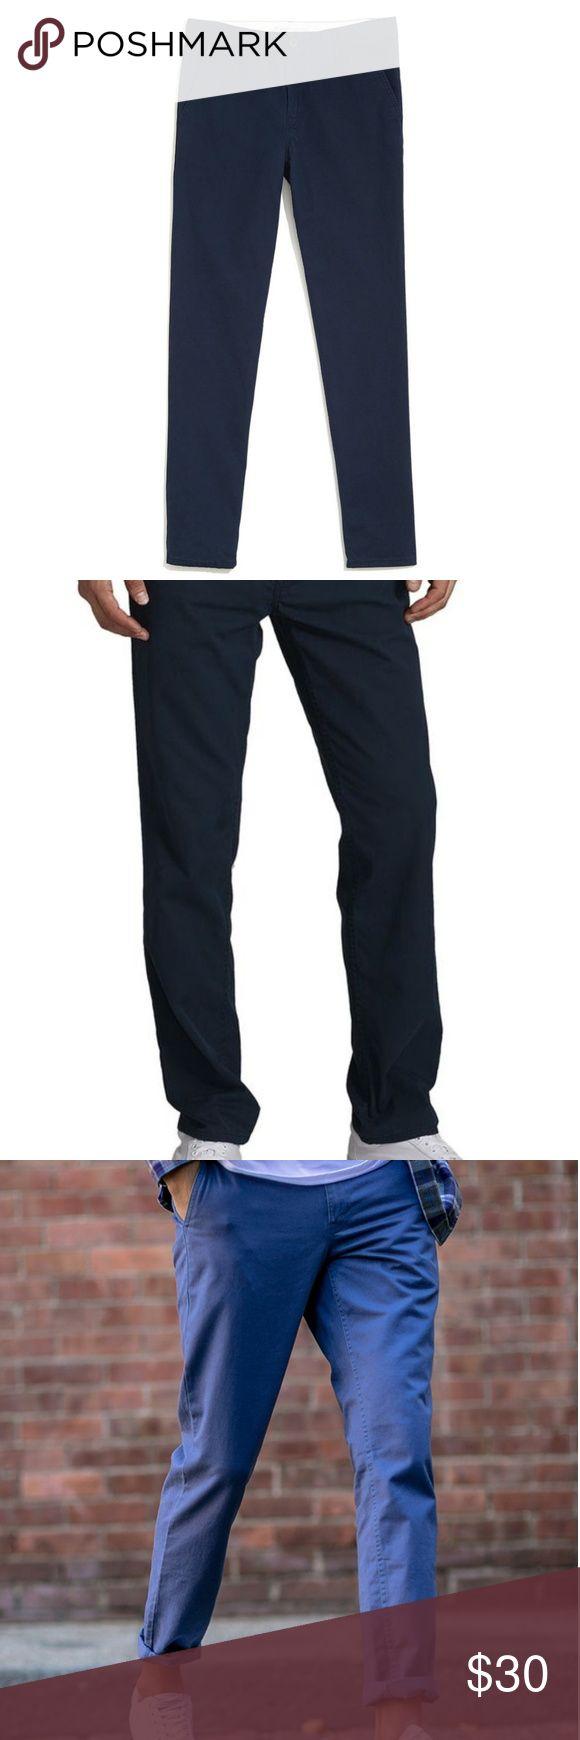 Men's JackThreads brand slim chino pants Navy blue slim chino pants Jack Threads Pants Chinos & Khakis